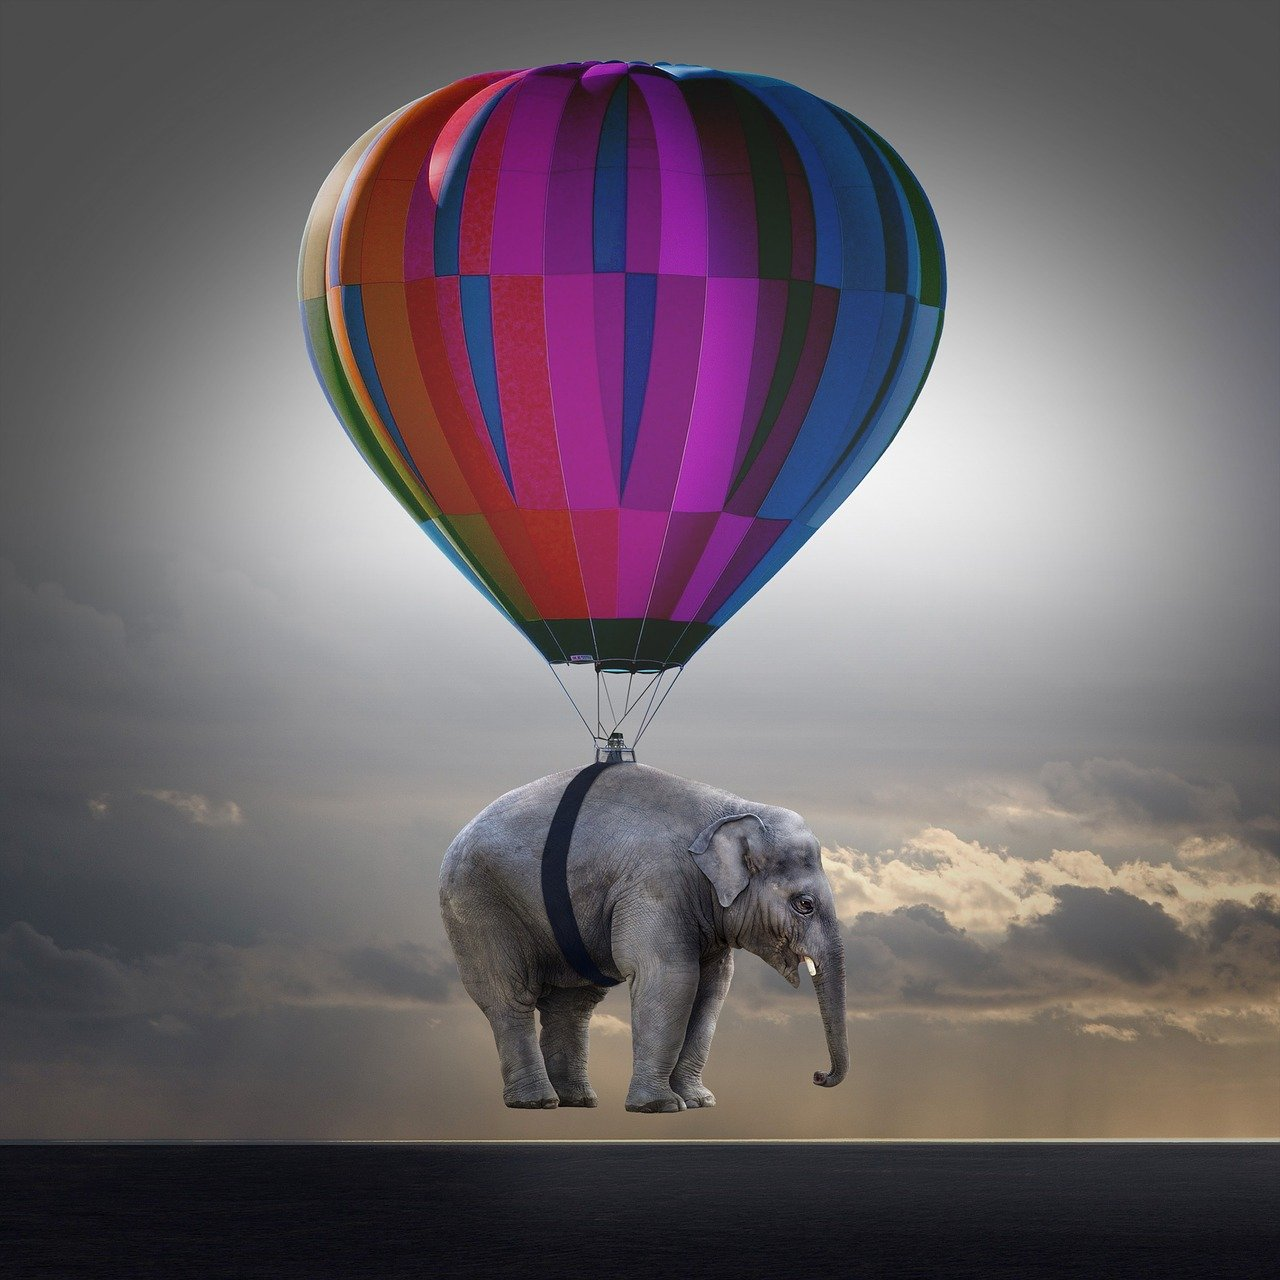 elephant, weightless, balloon